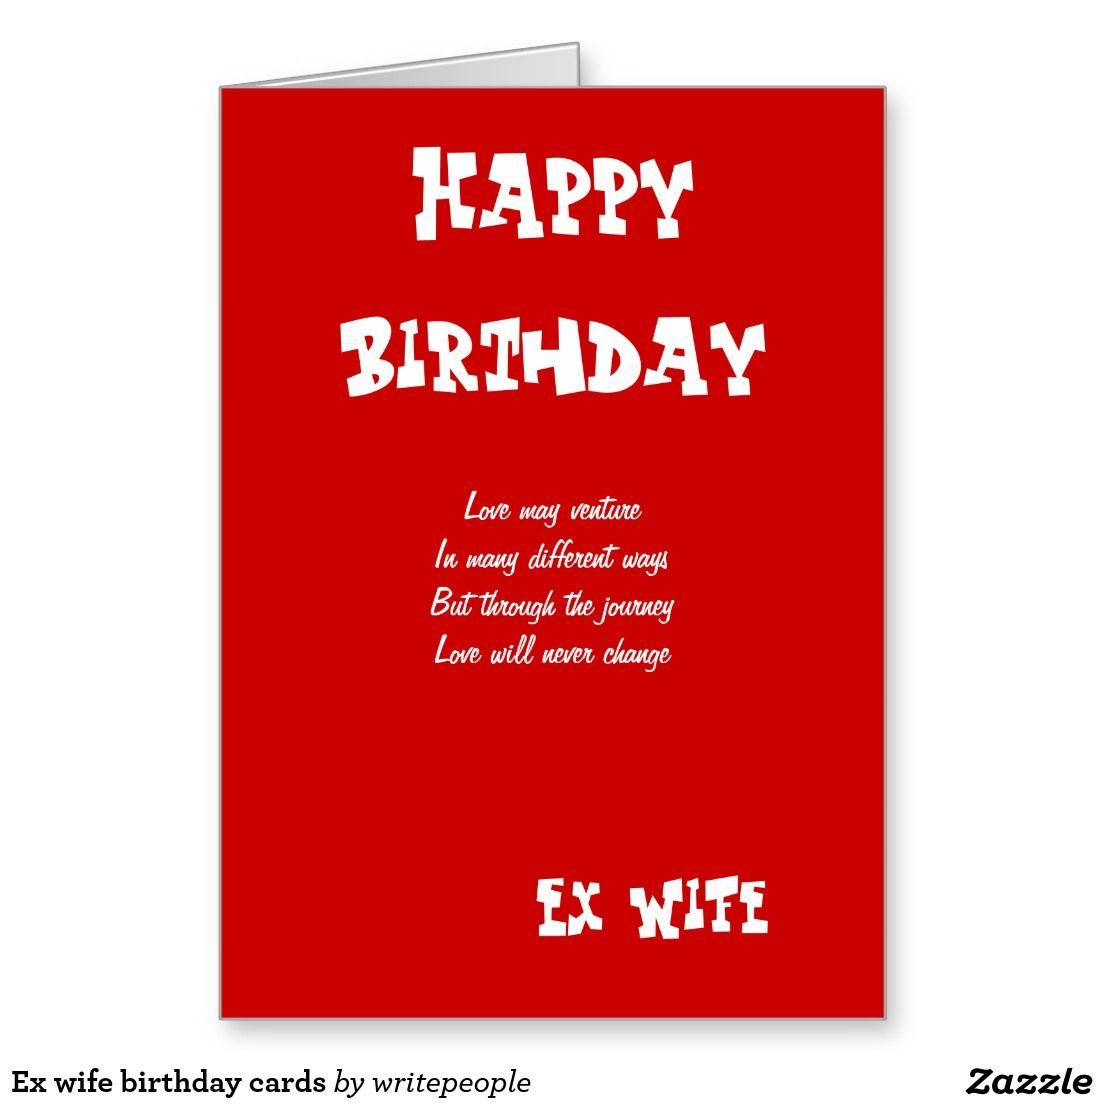 Ex Wife Birthday Cards